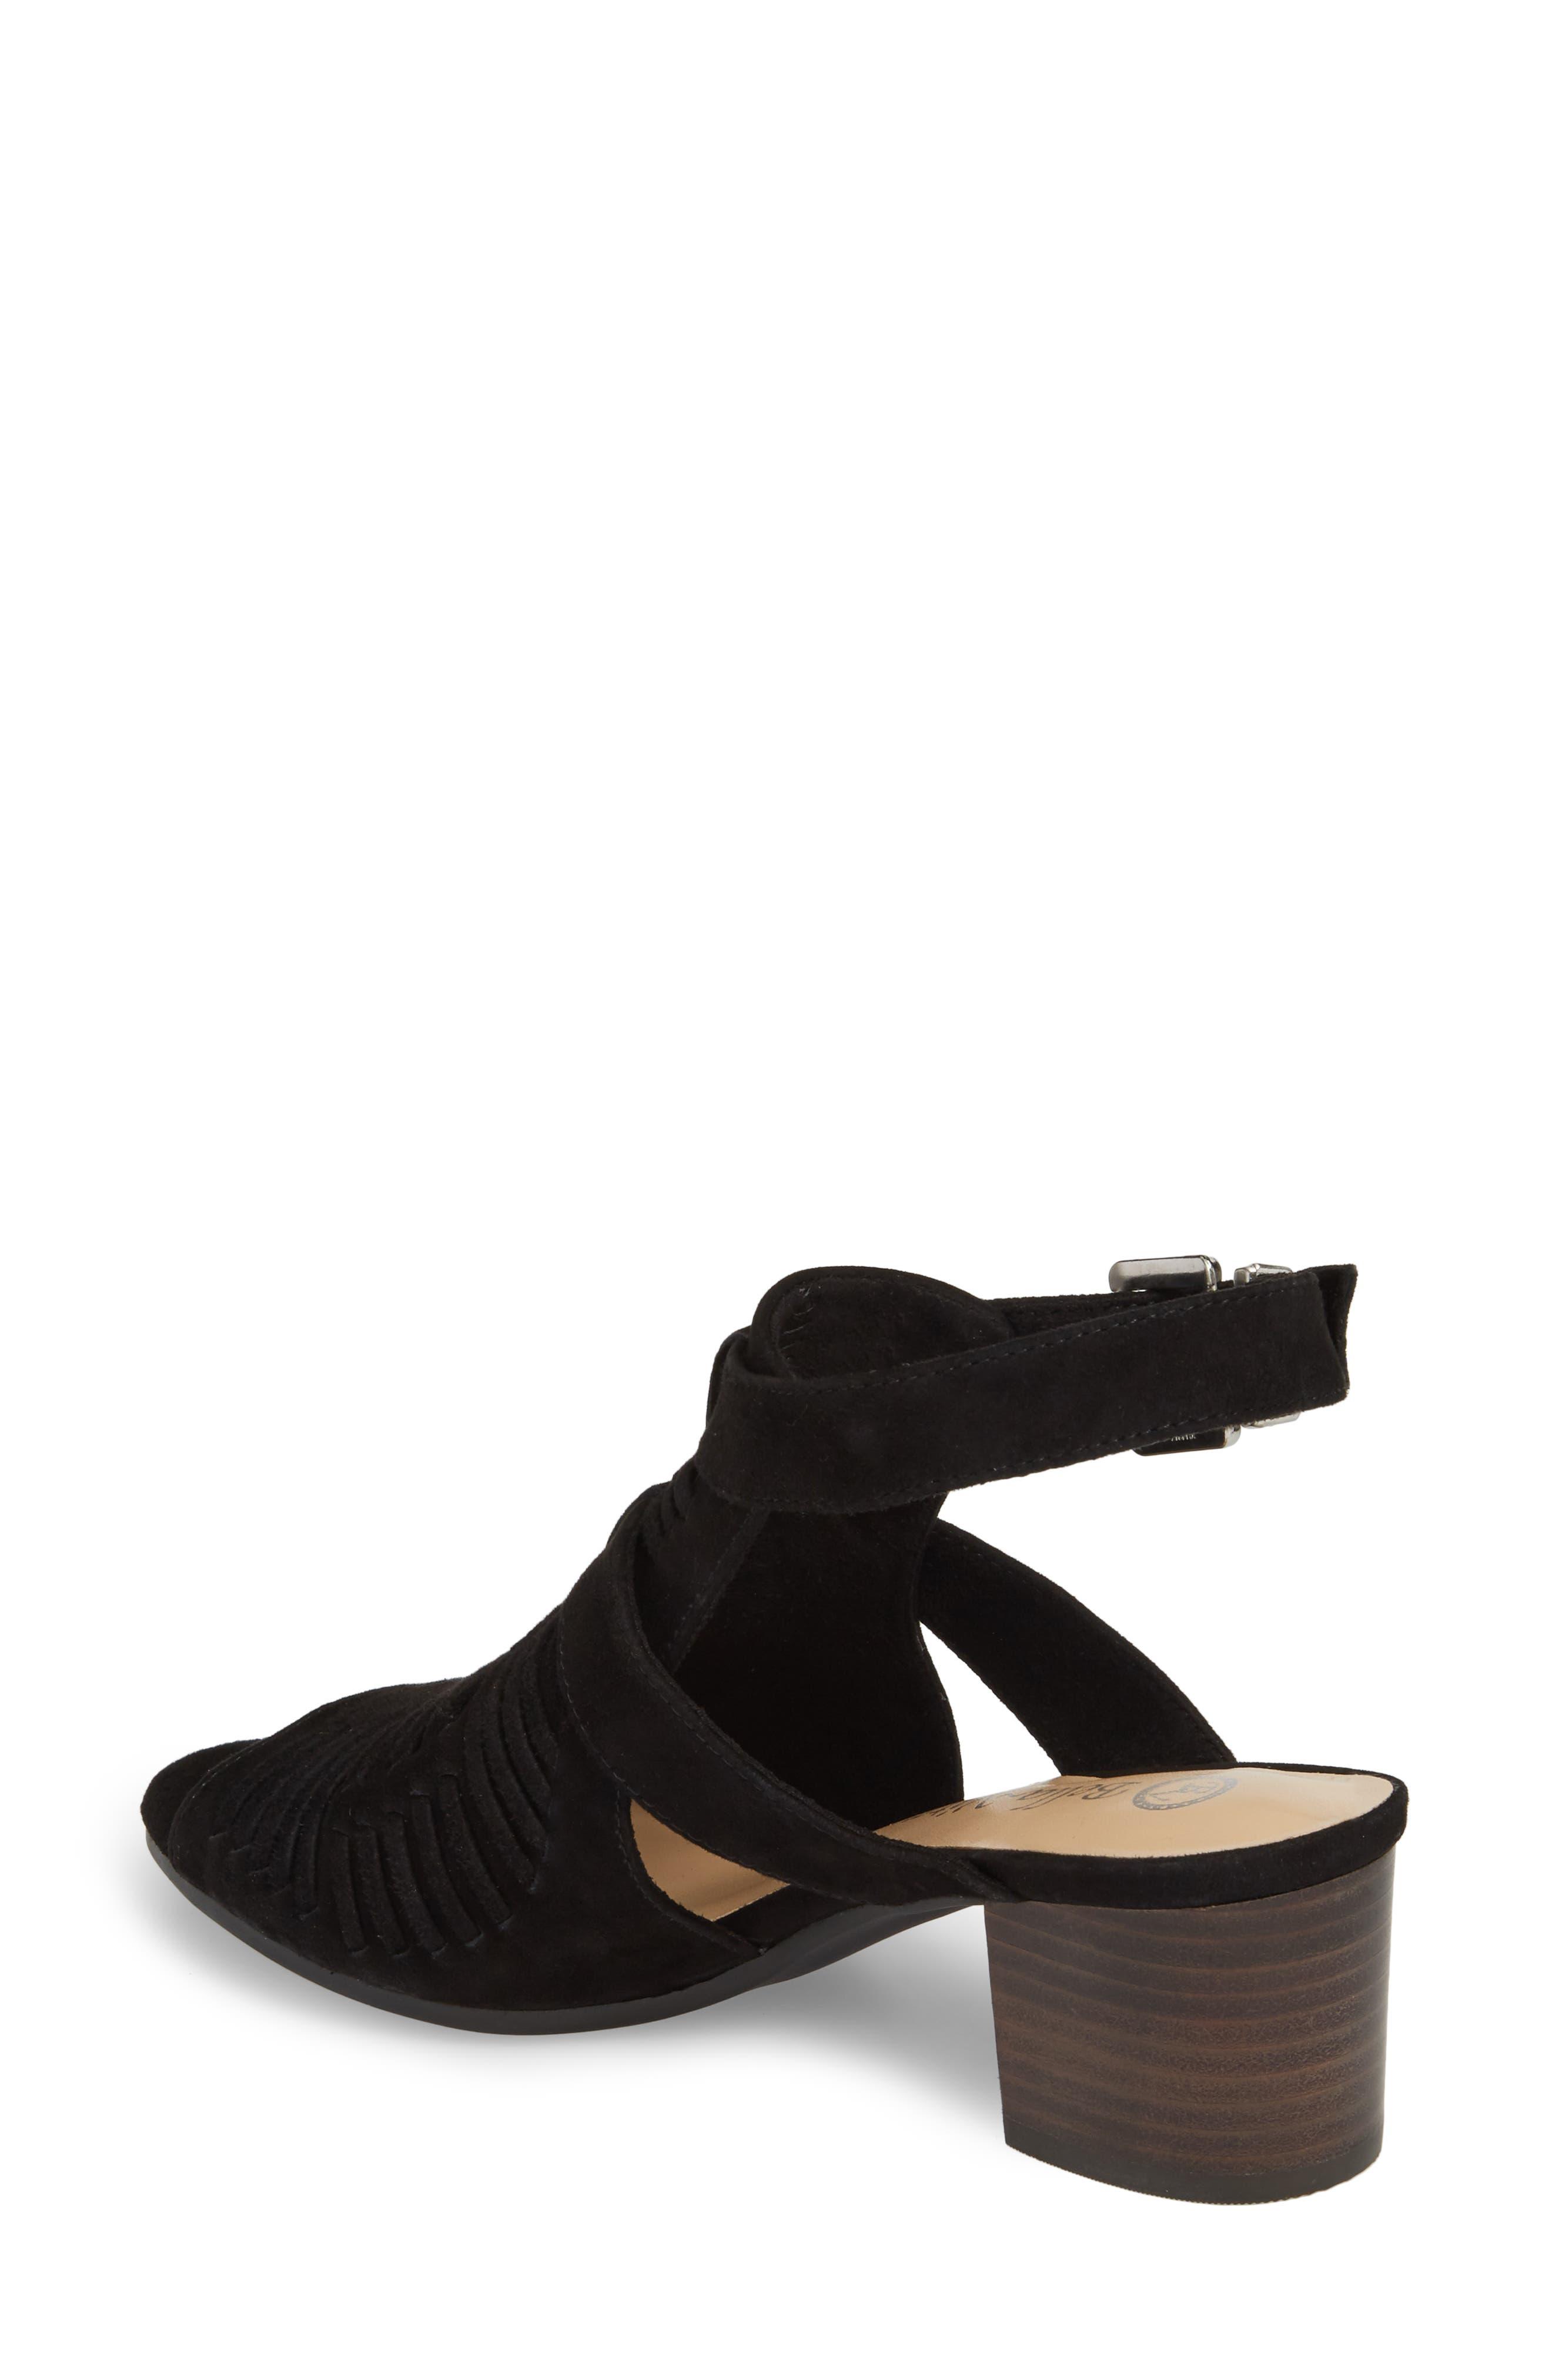 Finley Ankle Strap Sandal,                             Alternate thumbnail 2, color,                             Black Suede